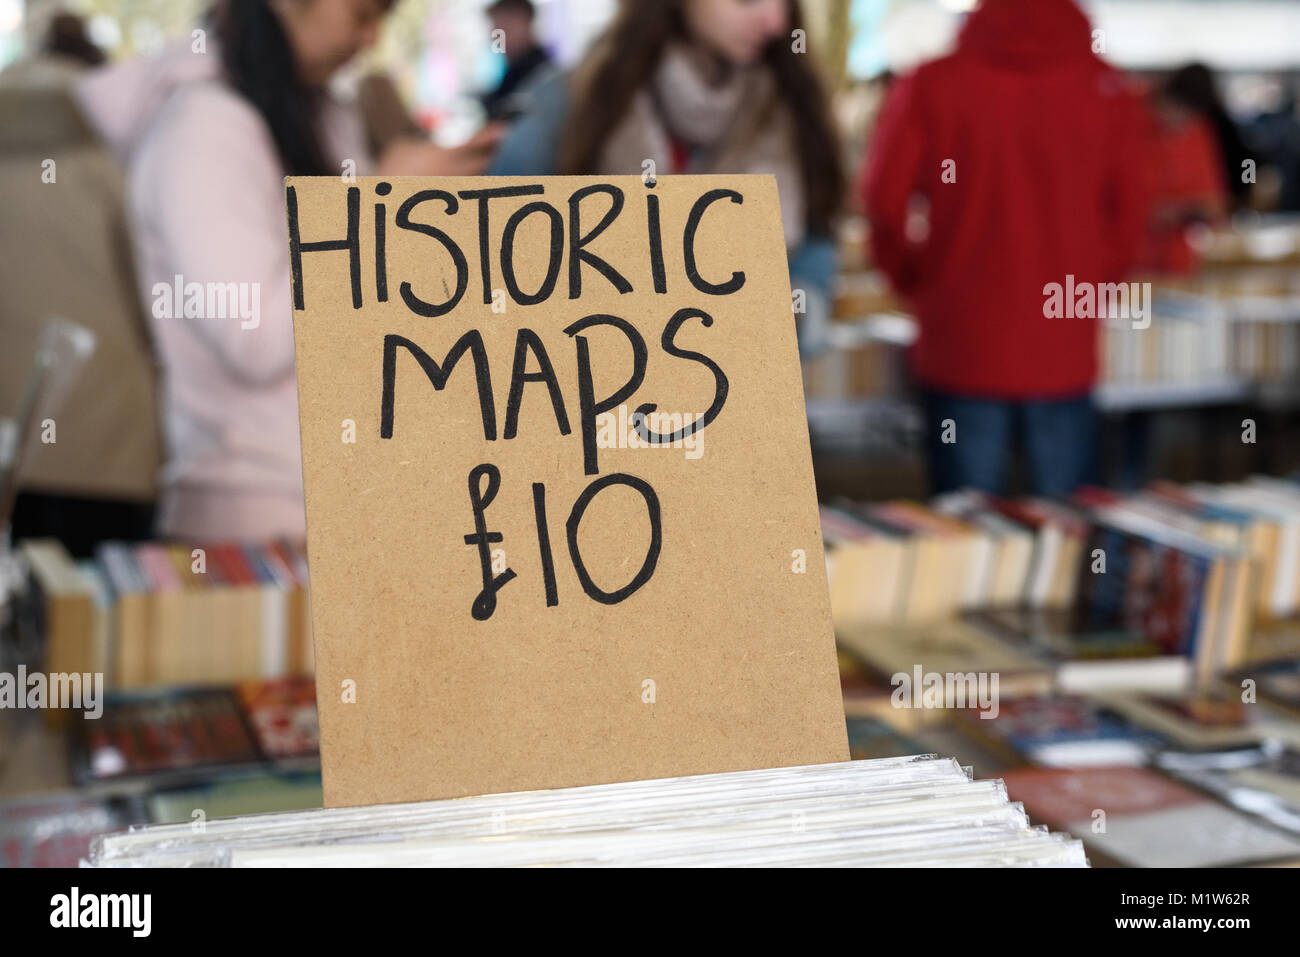 Antique Maps Uk Stock Photos Antique Maps Uk Stock Images Alamy - Antique maps for sale uk